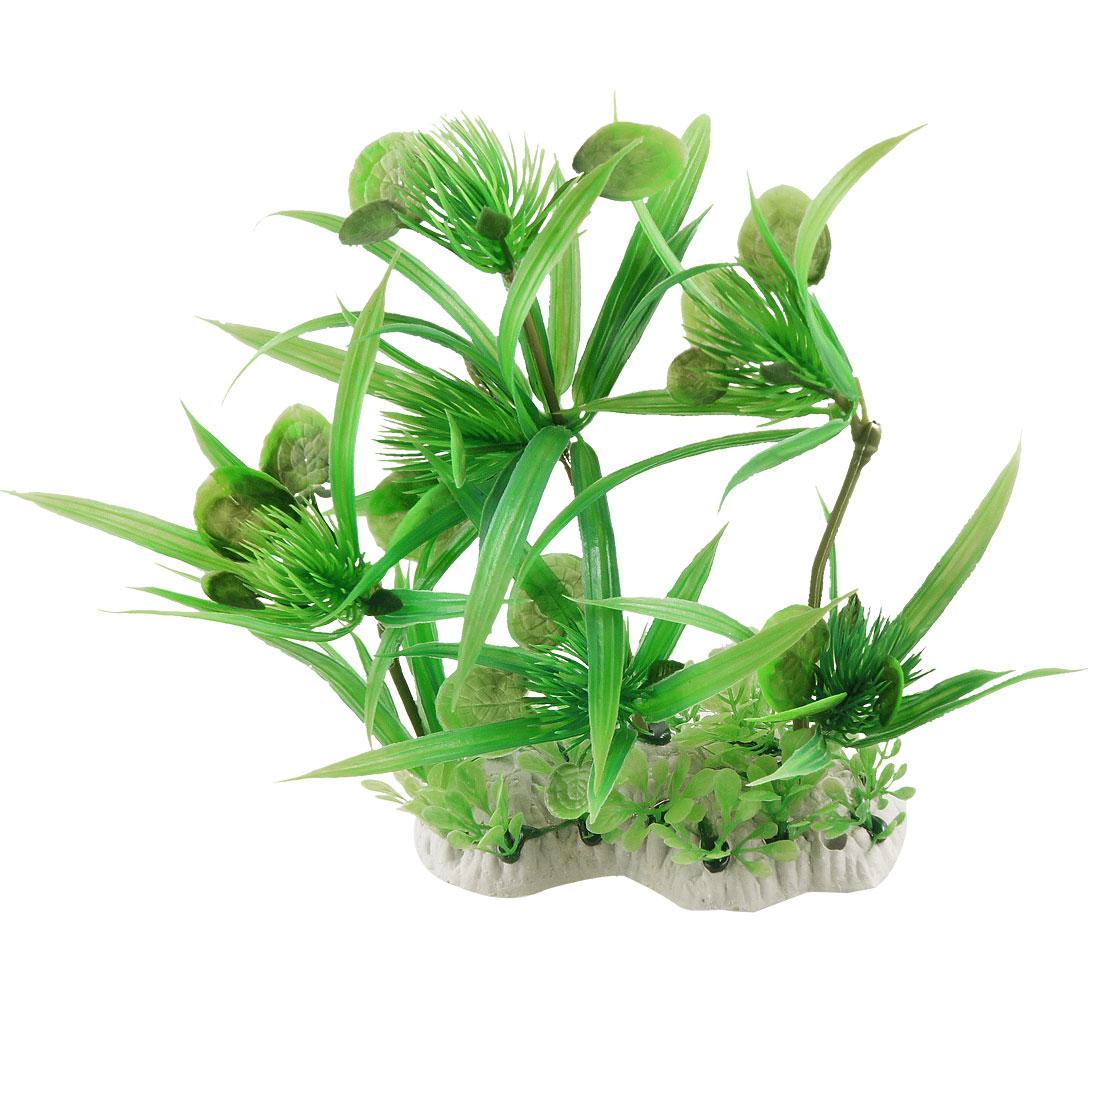 "Ceramic Base Lifelike Fish Tank Plastic Plant Decor Aquascaping Green 7.7"""